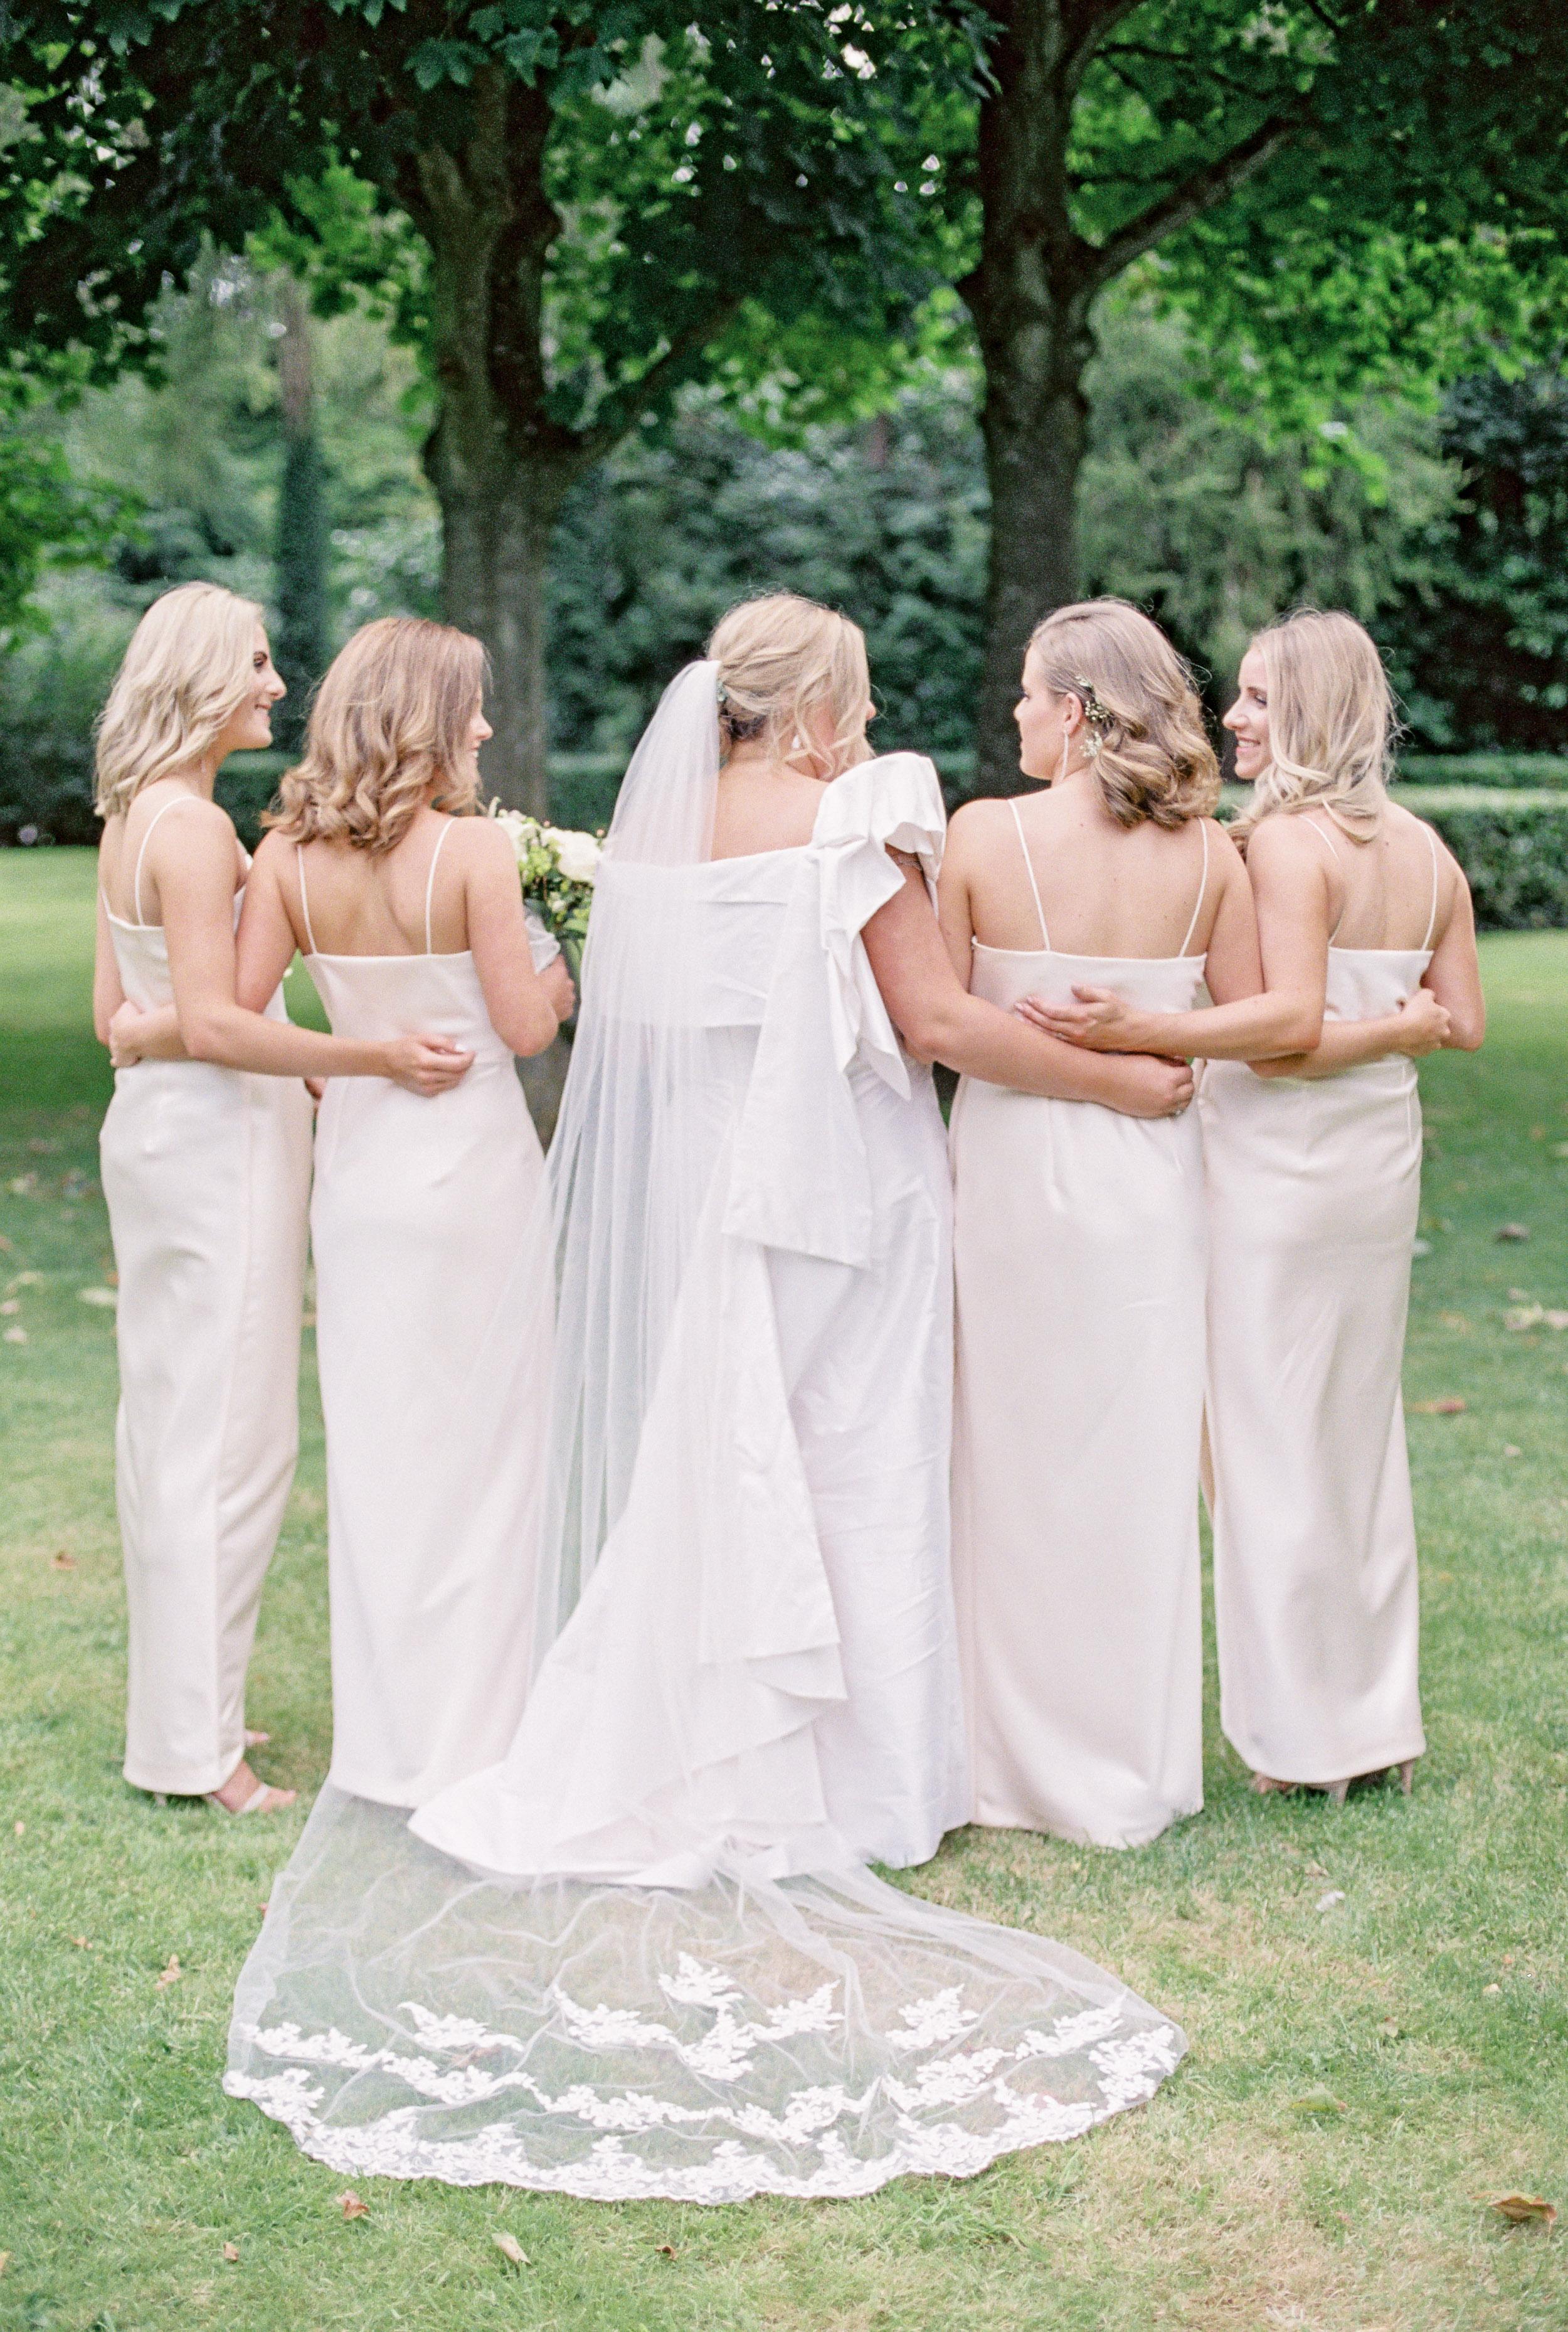 Liz Baker Fine Art Photography Emma Joy The Wedding Planner 3.jpg